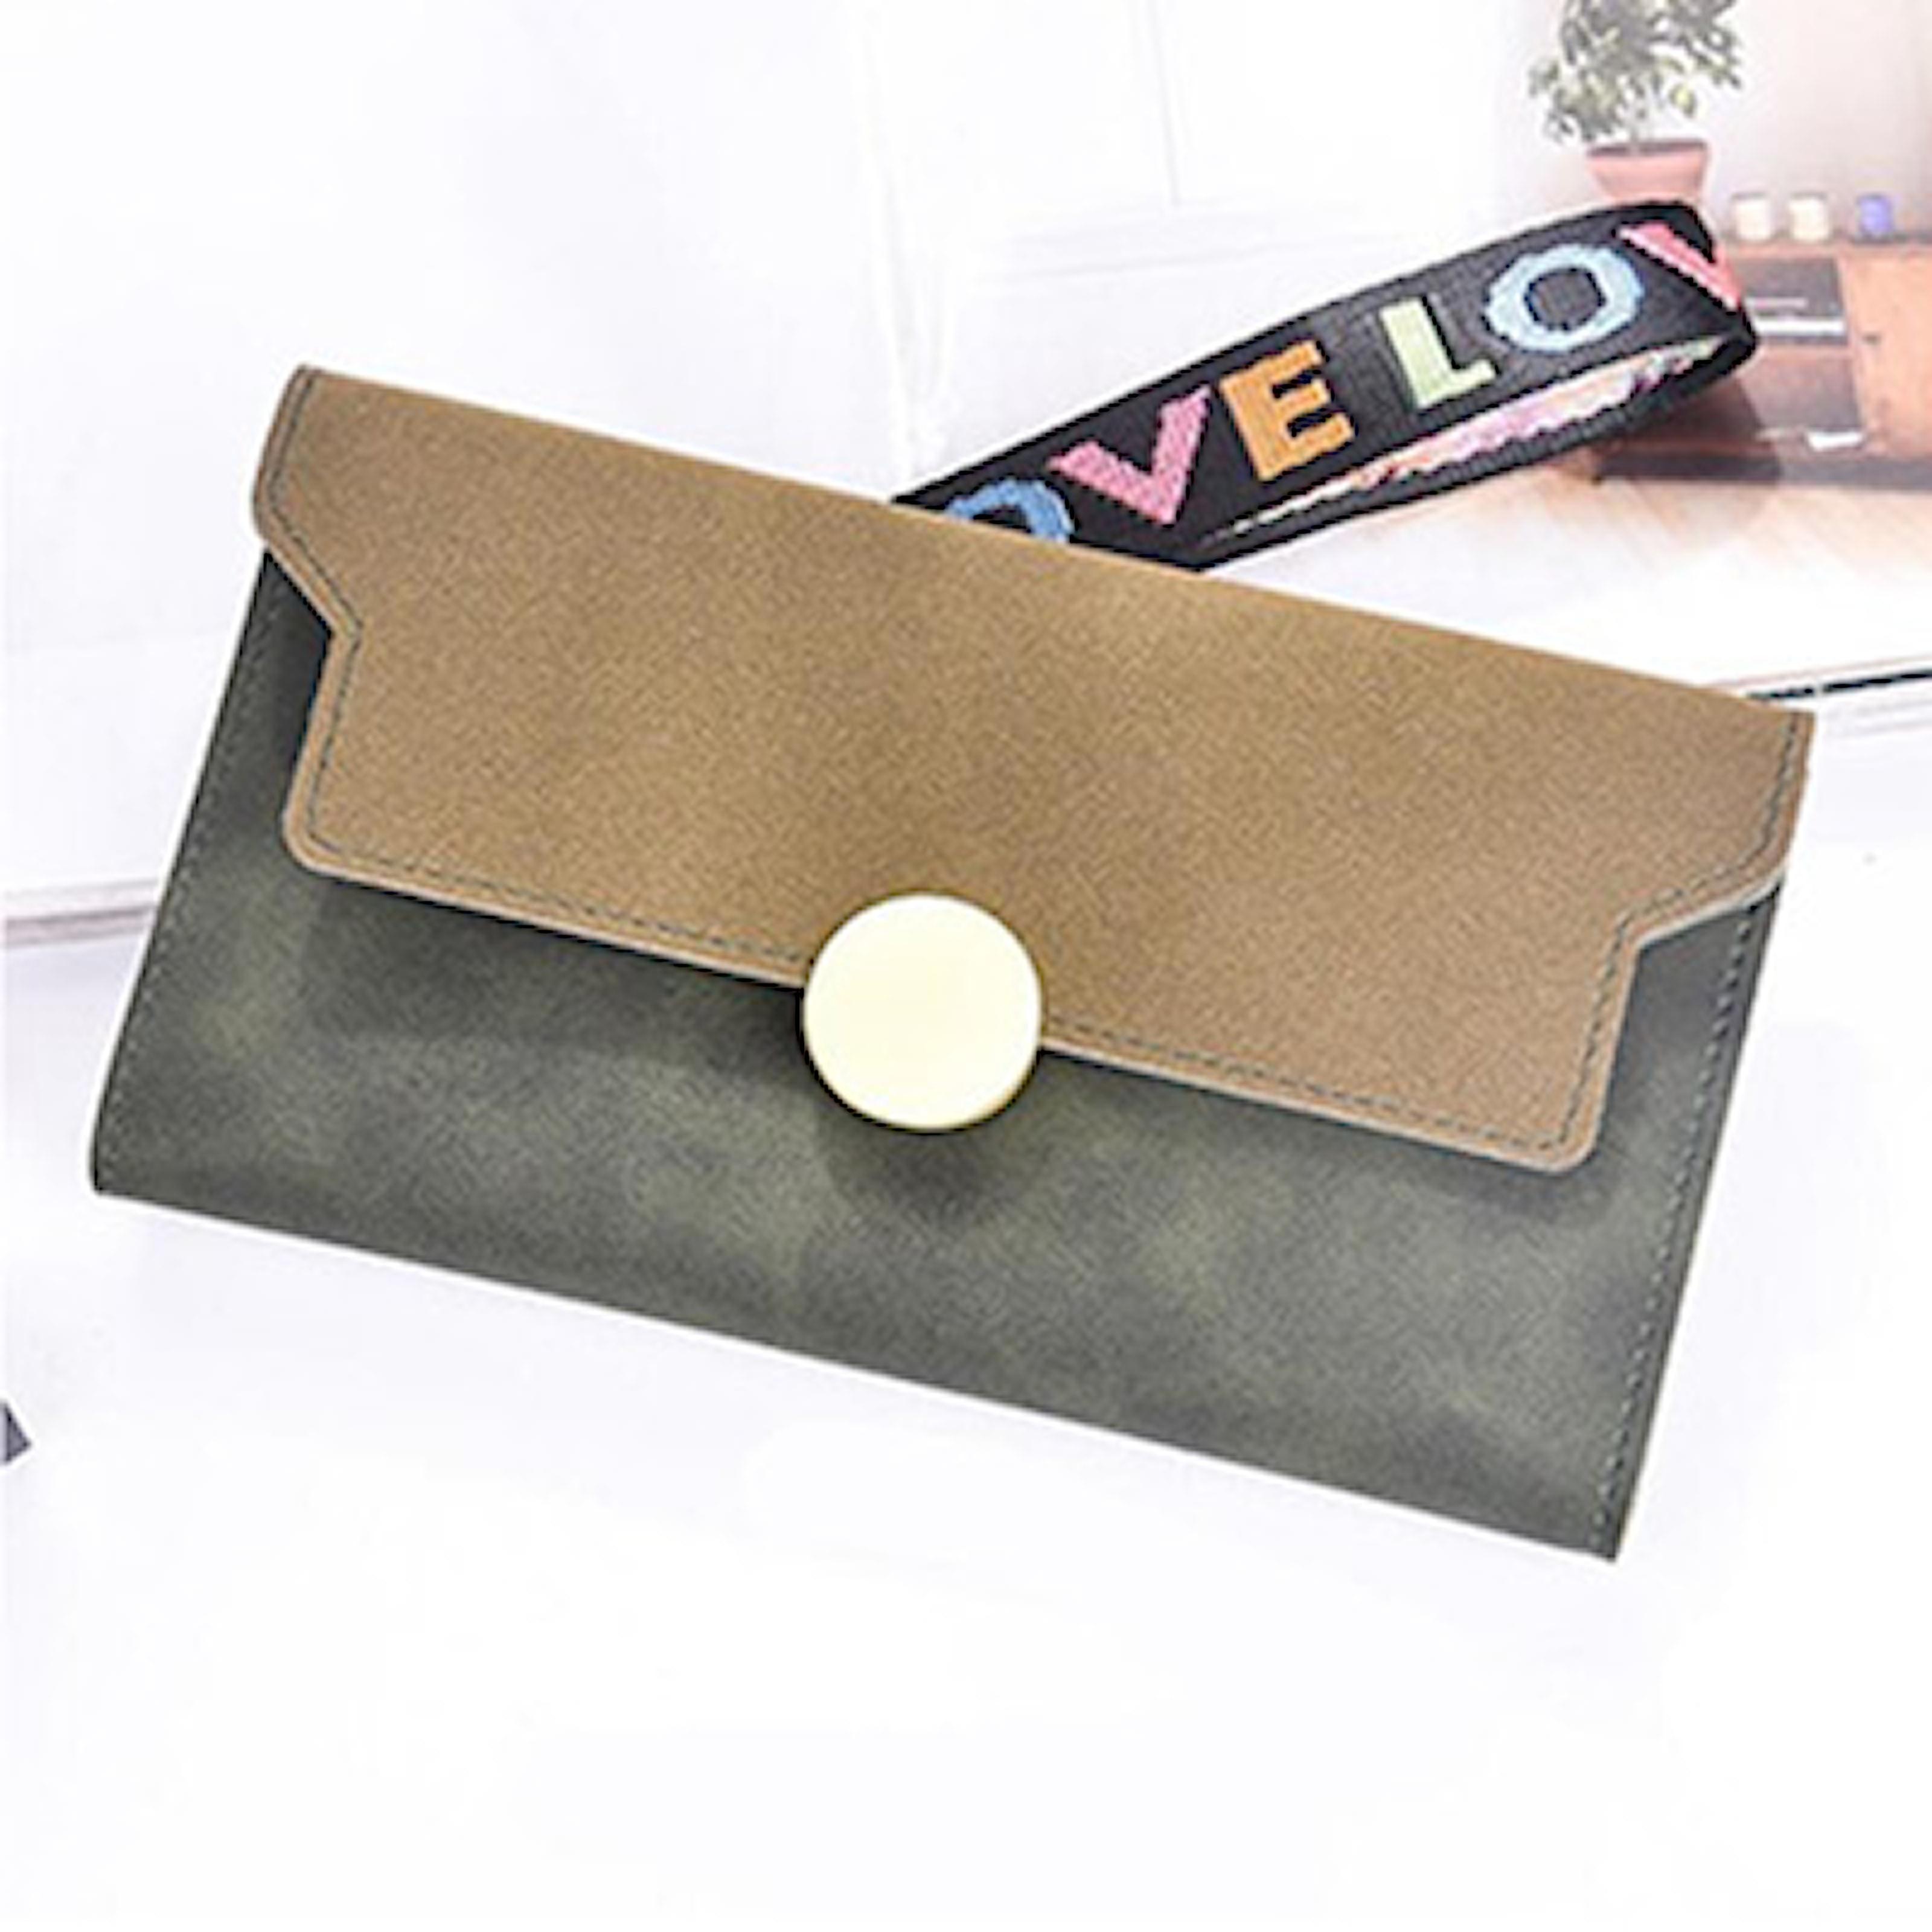 Grön, Hengsheng 070 Wallet, Plånbok med gulddetaljer, ,